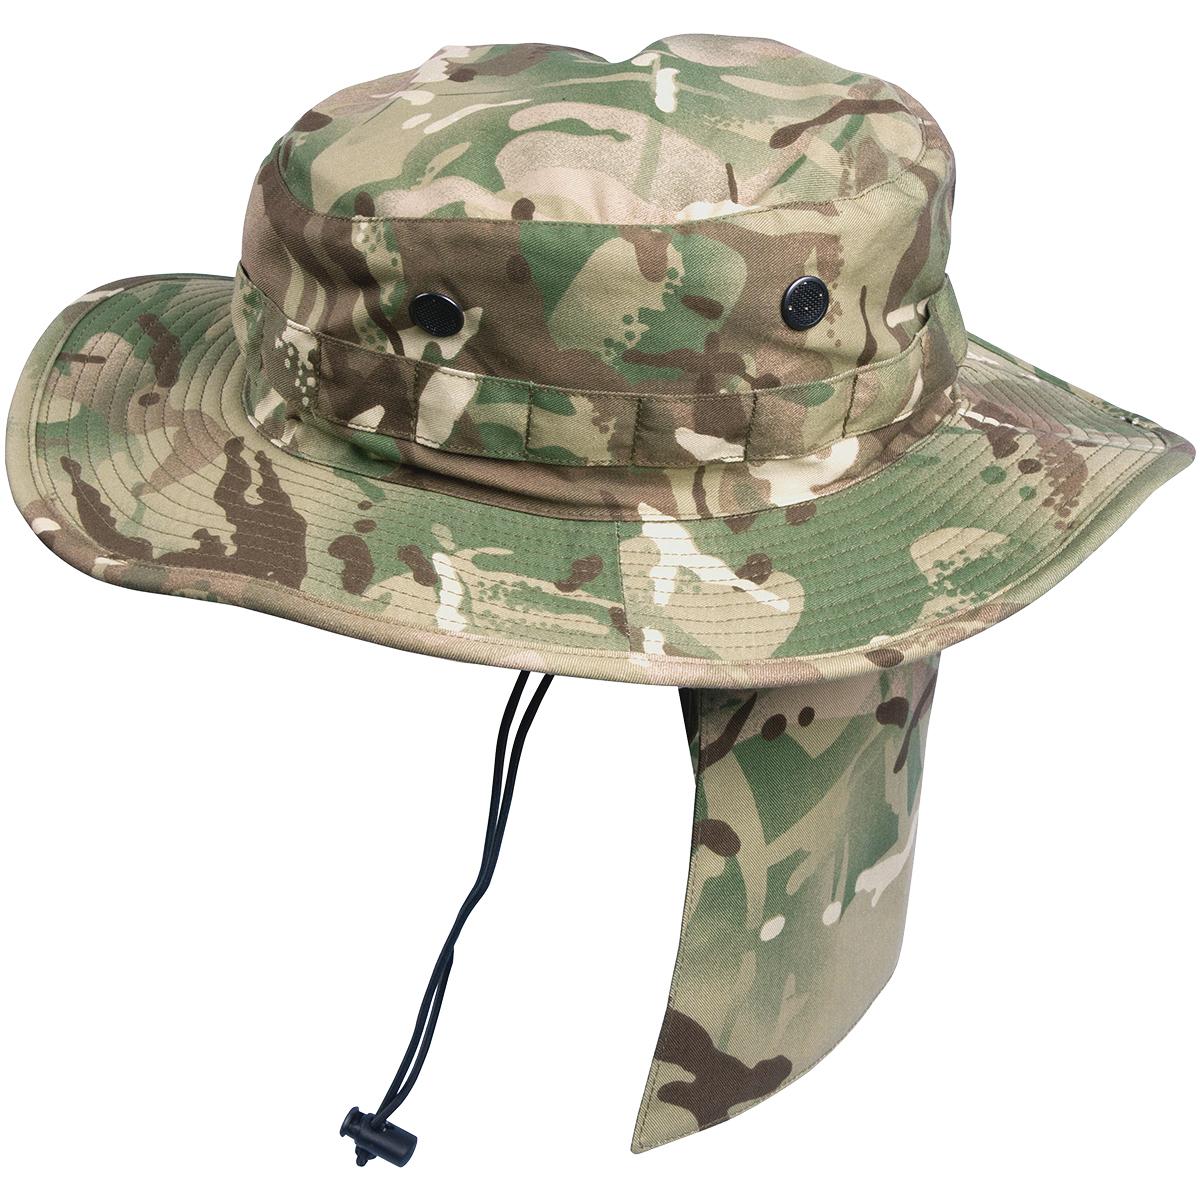 Sentinel HELIKON TACTICAL ARMY MILITARY GI BOONIE JUNGLE BUSH HAT HIKING  FISHING MTP CAMO fe7808d9c54